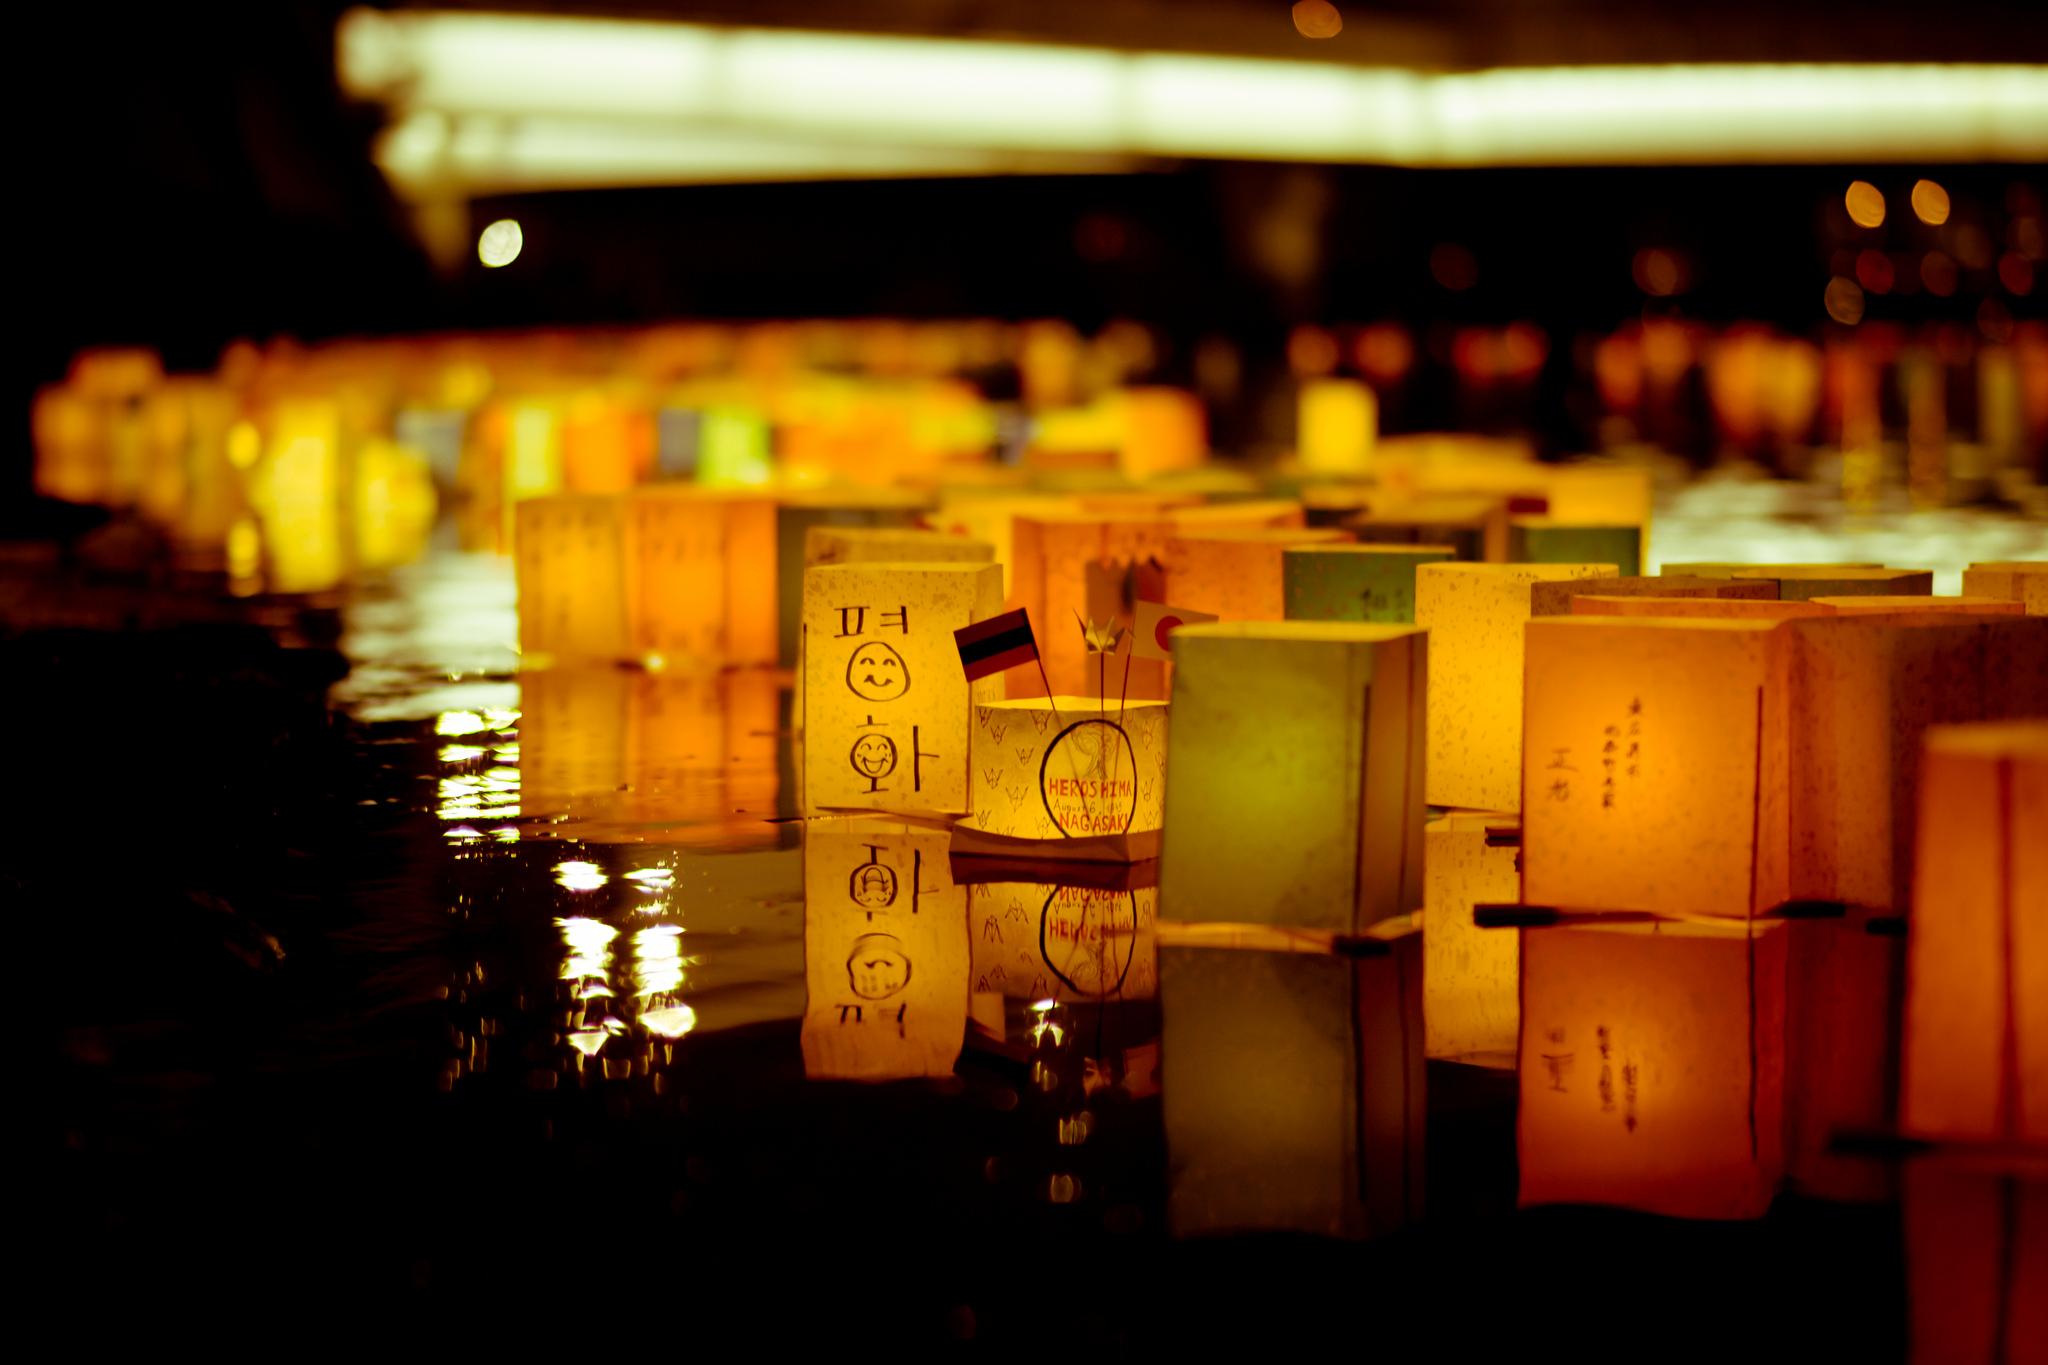 Lantern ceremony  photo  by  Freedom II Andres  via flickr.